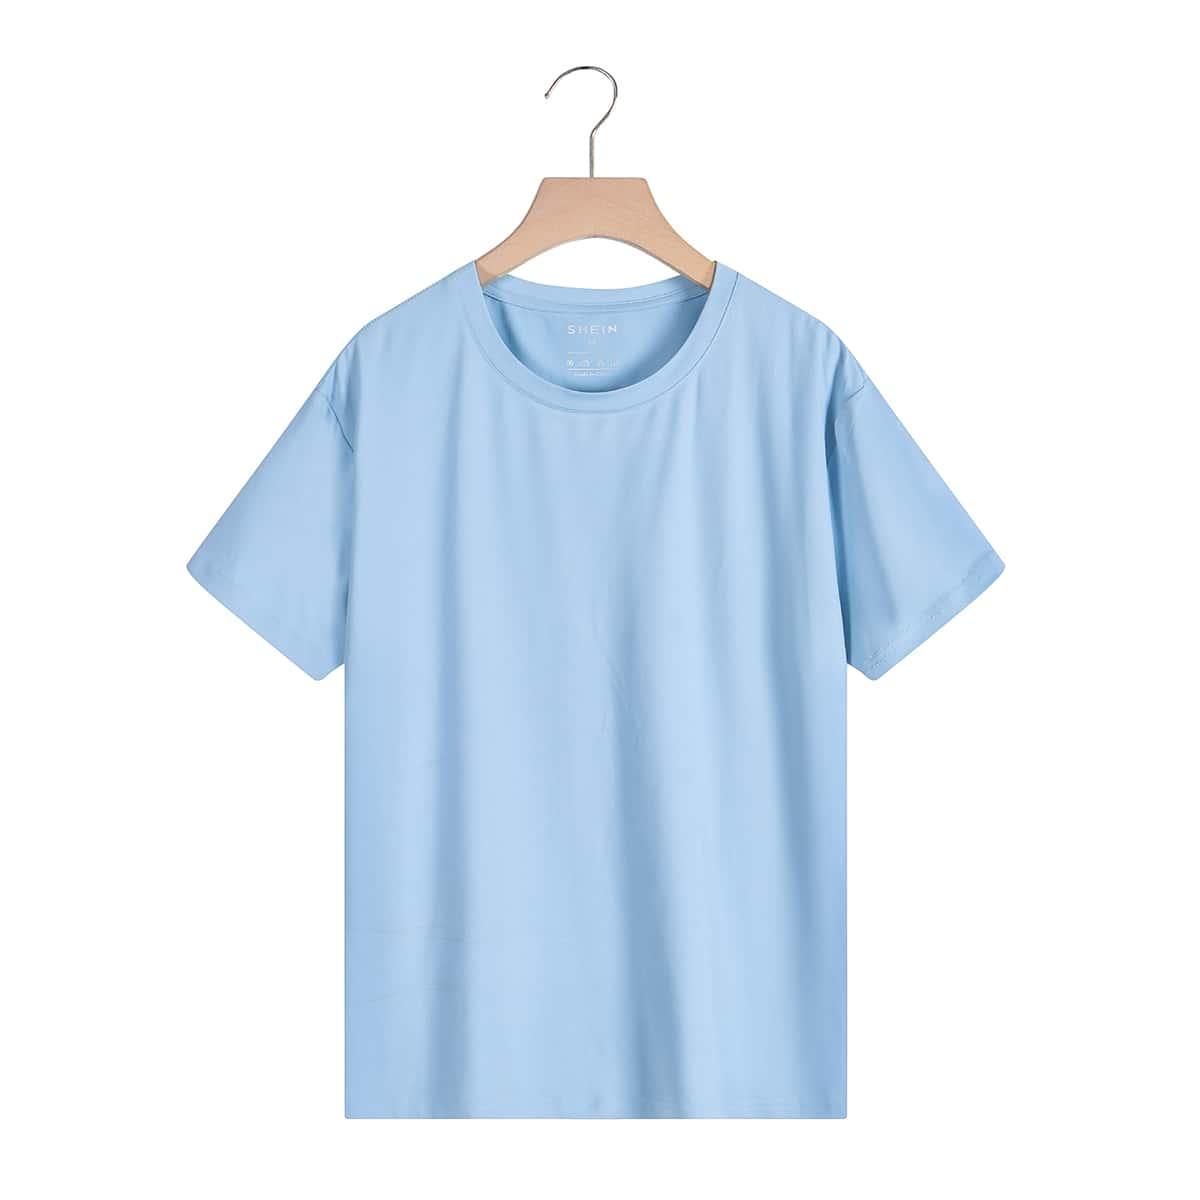 Однотонная футболка SheIn swtee24210517340